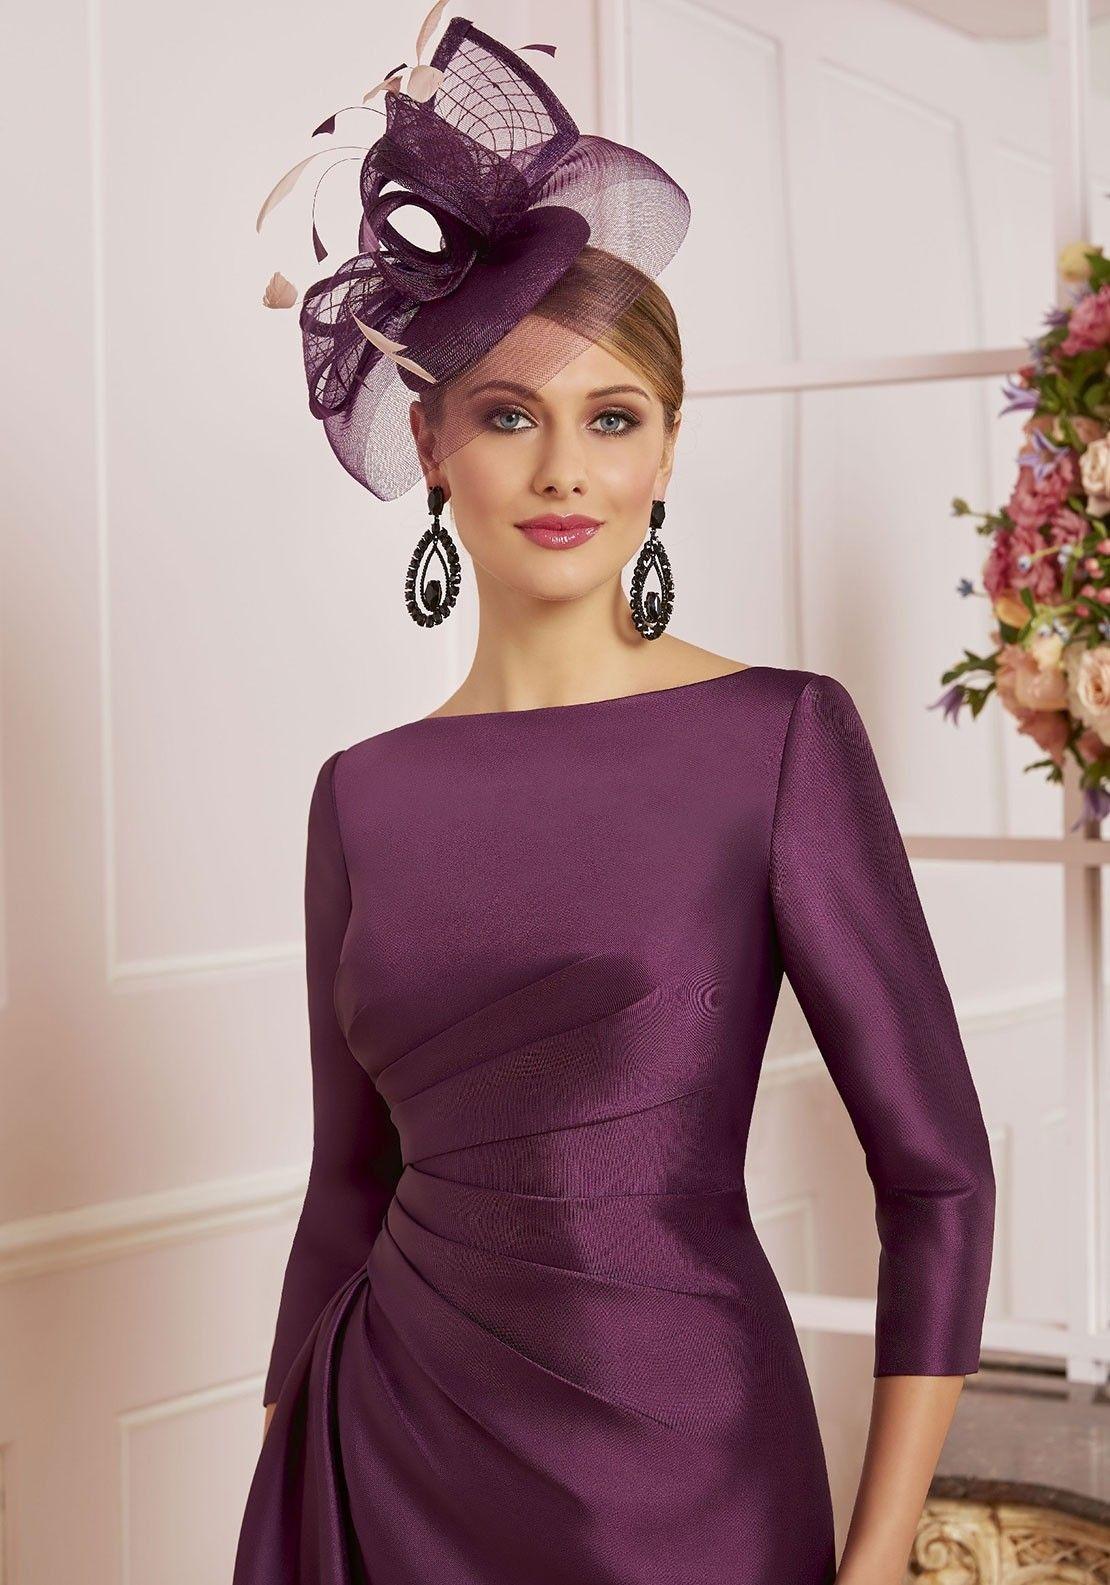 Veni Infantino For Ronald Joyce Mikado Satin Dress Aubergine Evening Gown Dresses Occasion Dresses Wedding Guest Dresses [ 1585 x 1110 Pixel ]